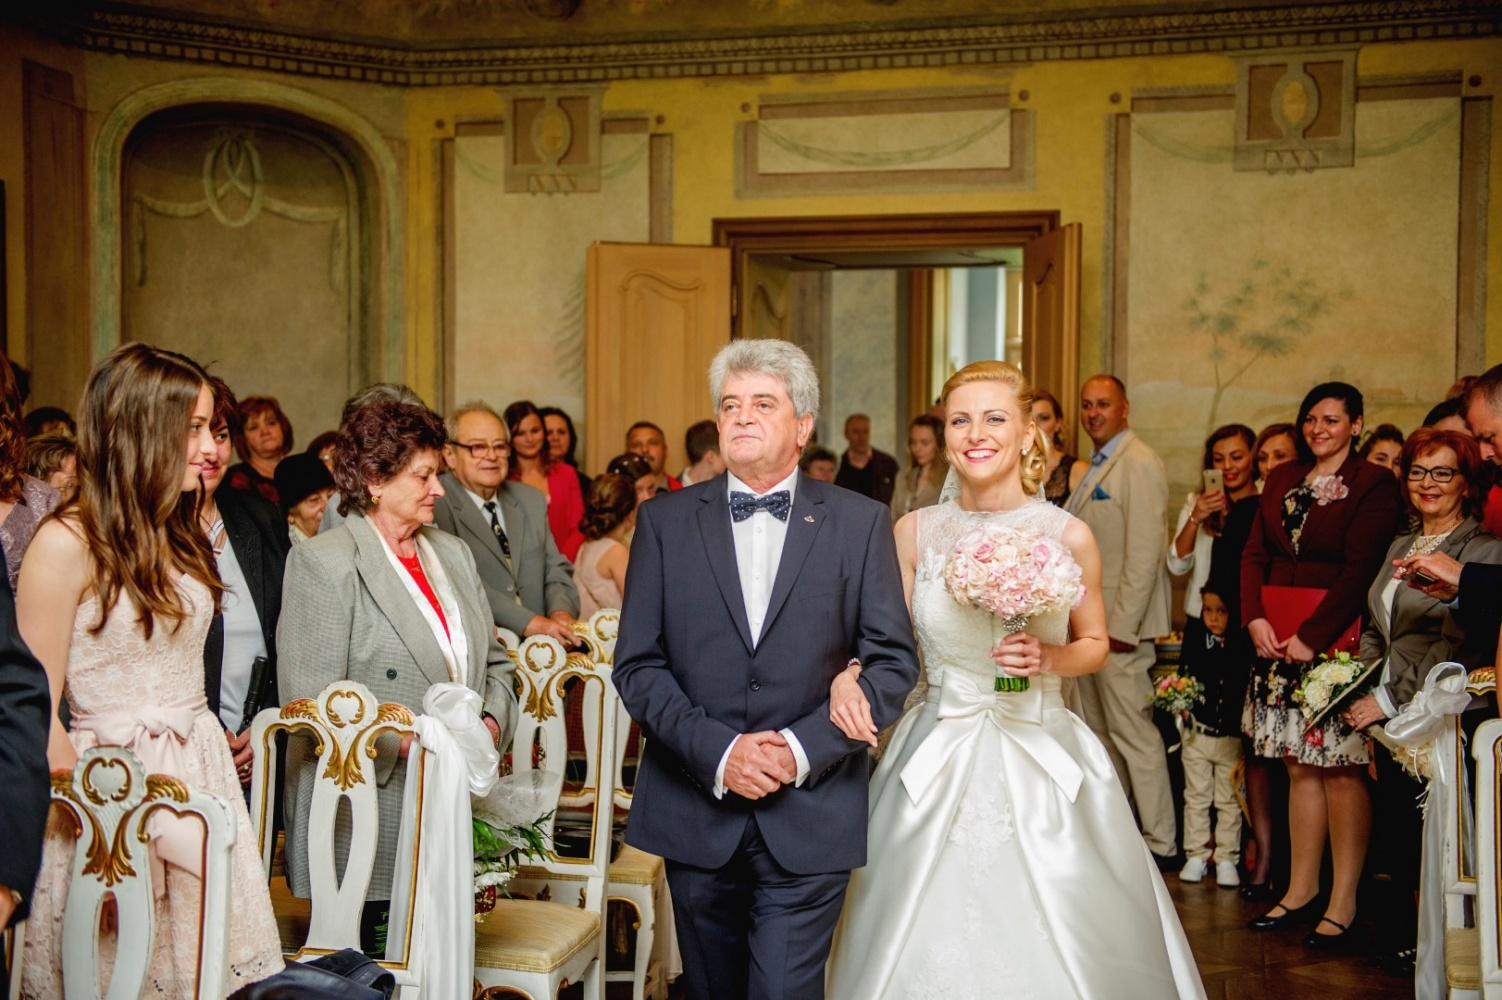 http://www.fotoz.sk/images/gallery-26/normal/svadba_hotel-chateau-bela_070.jpg